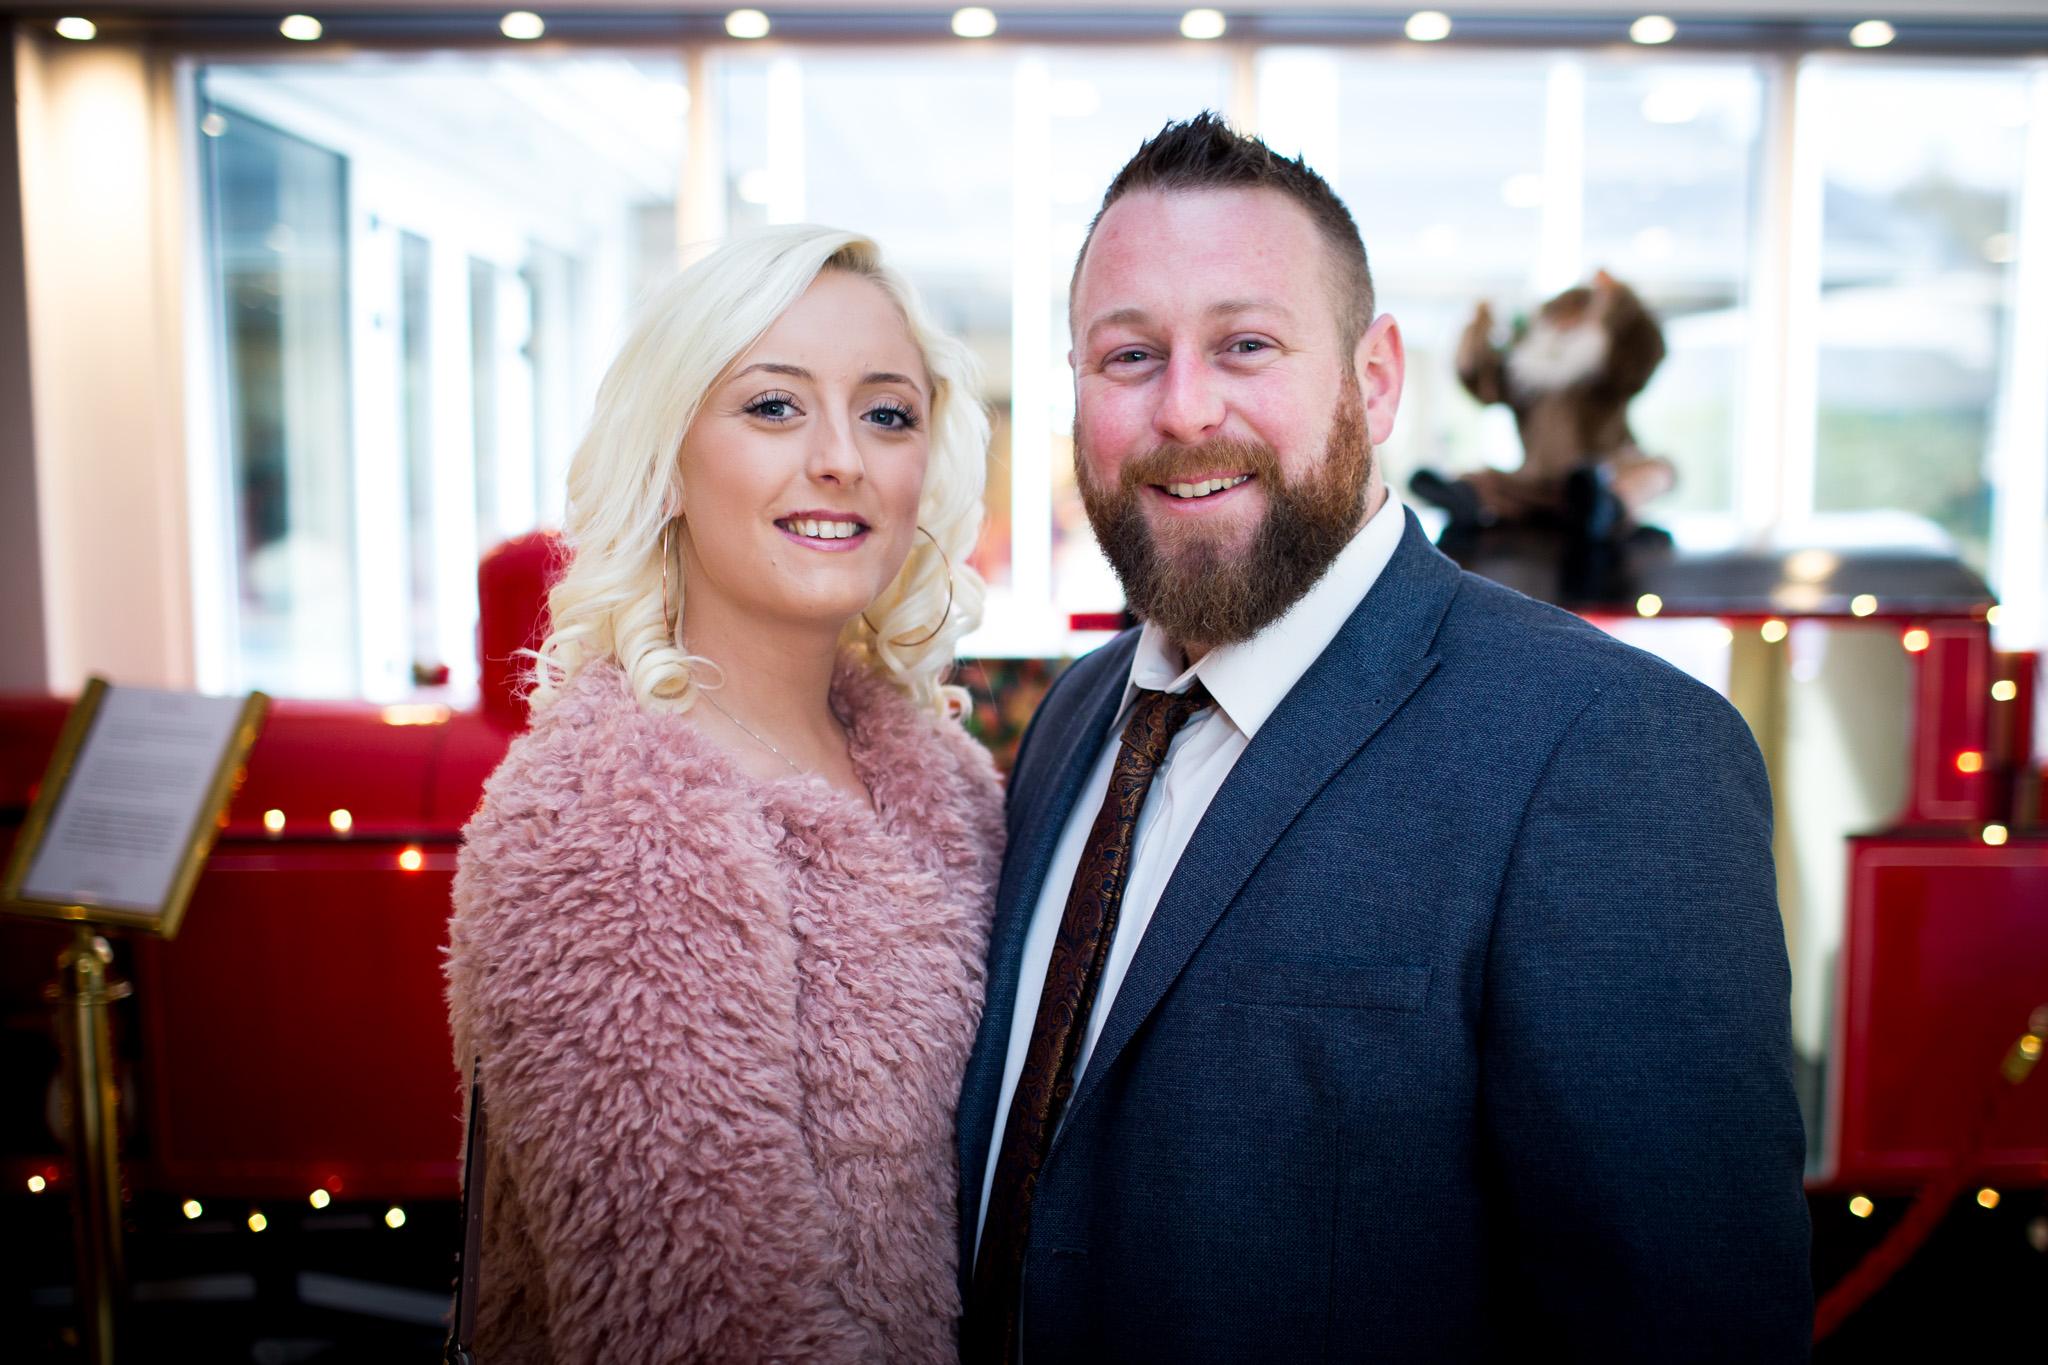 Mark_Barnes_Northern_Ireland_wedding_photographer_Harveys_Point_Donegall_Wedding_photography-Adam&Gemma-32.jpg